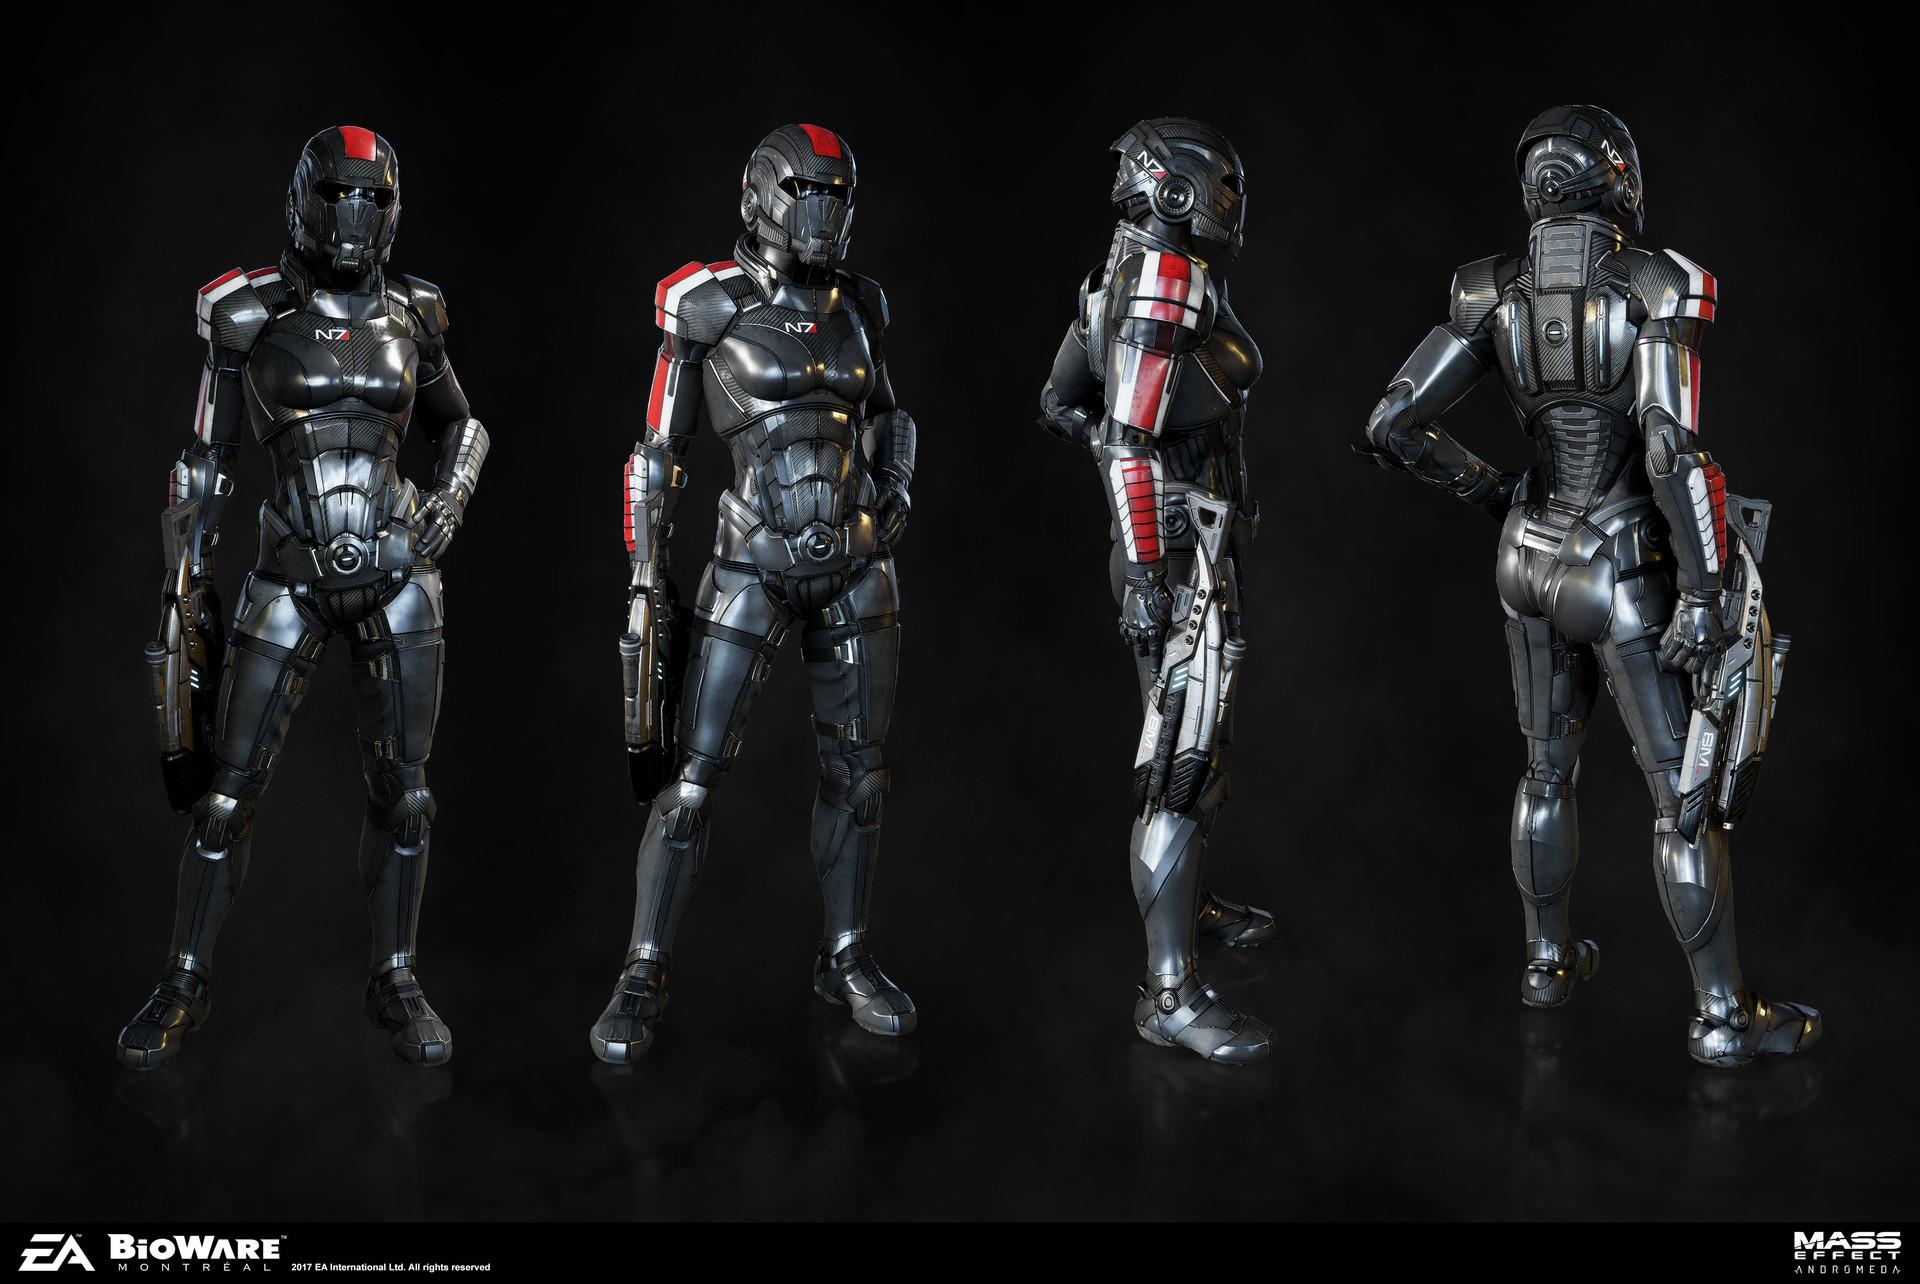 N7 Armor Mass Effect Andromeda: Herbert Lowis